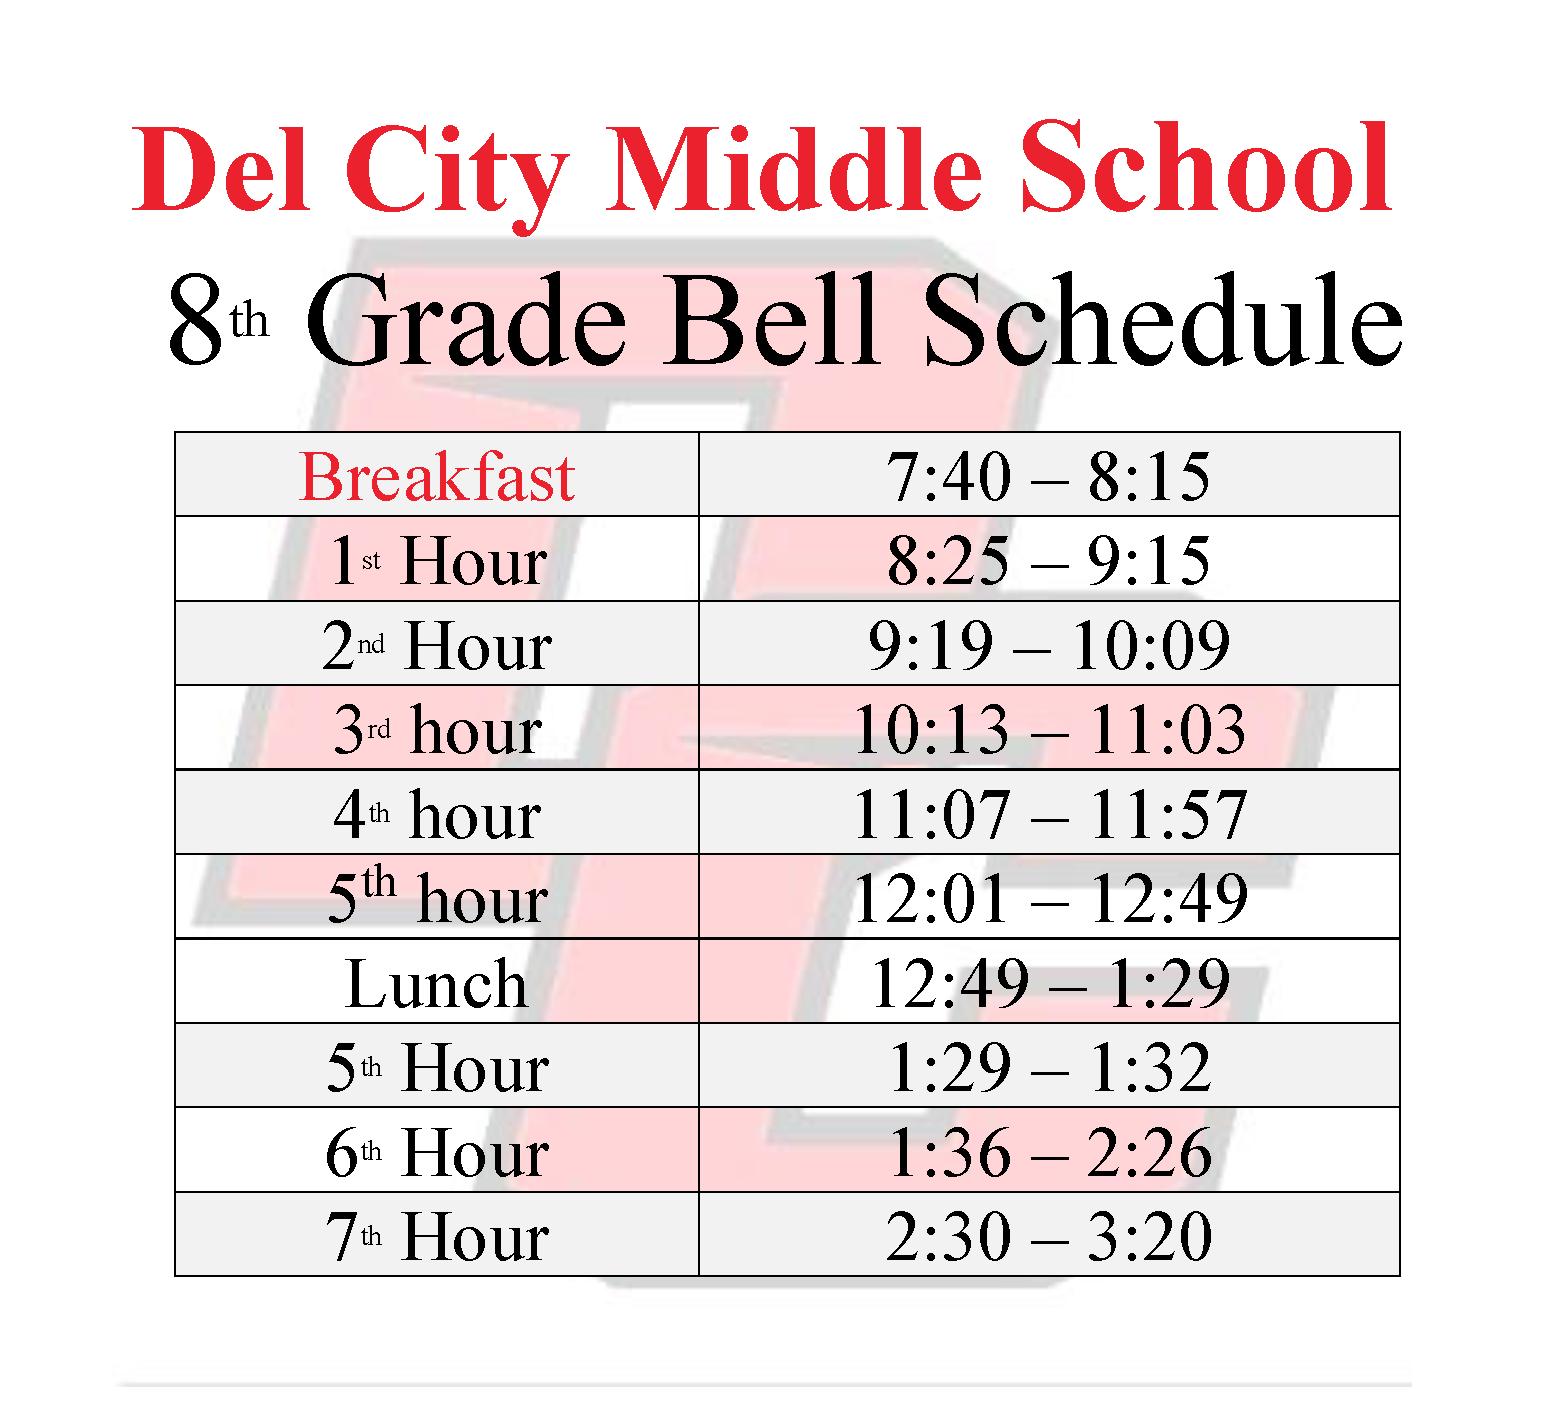 8th Grade Bell Schedule